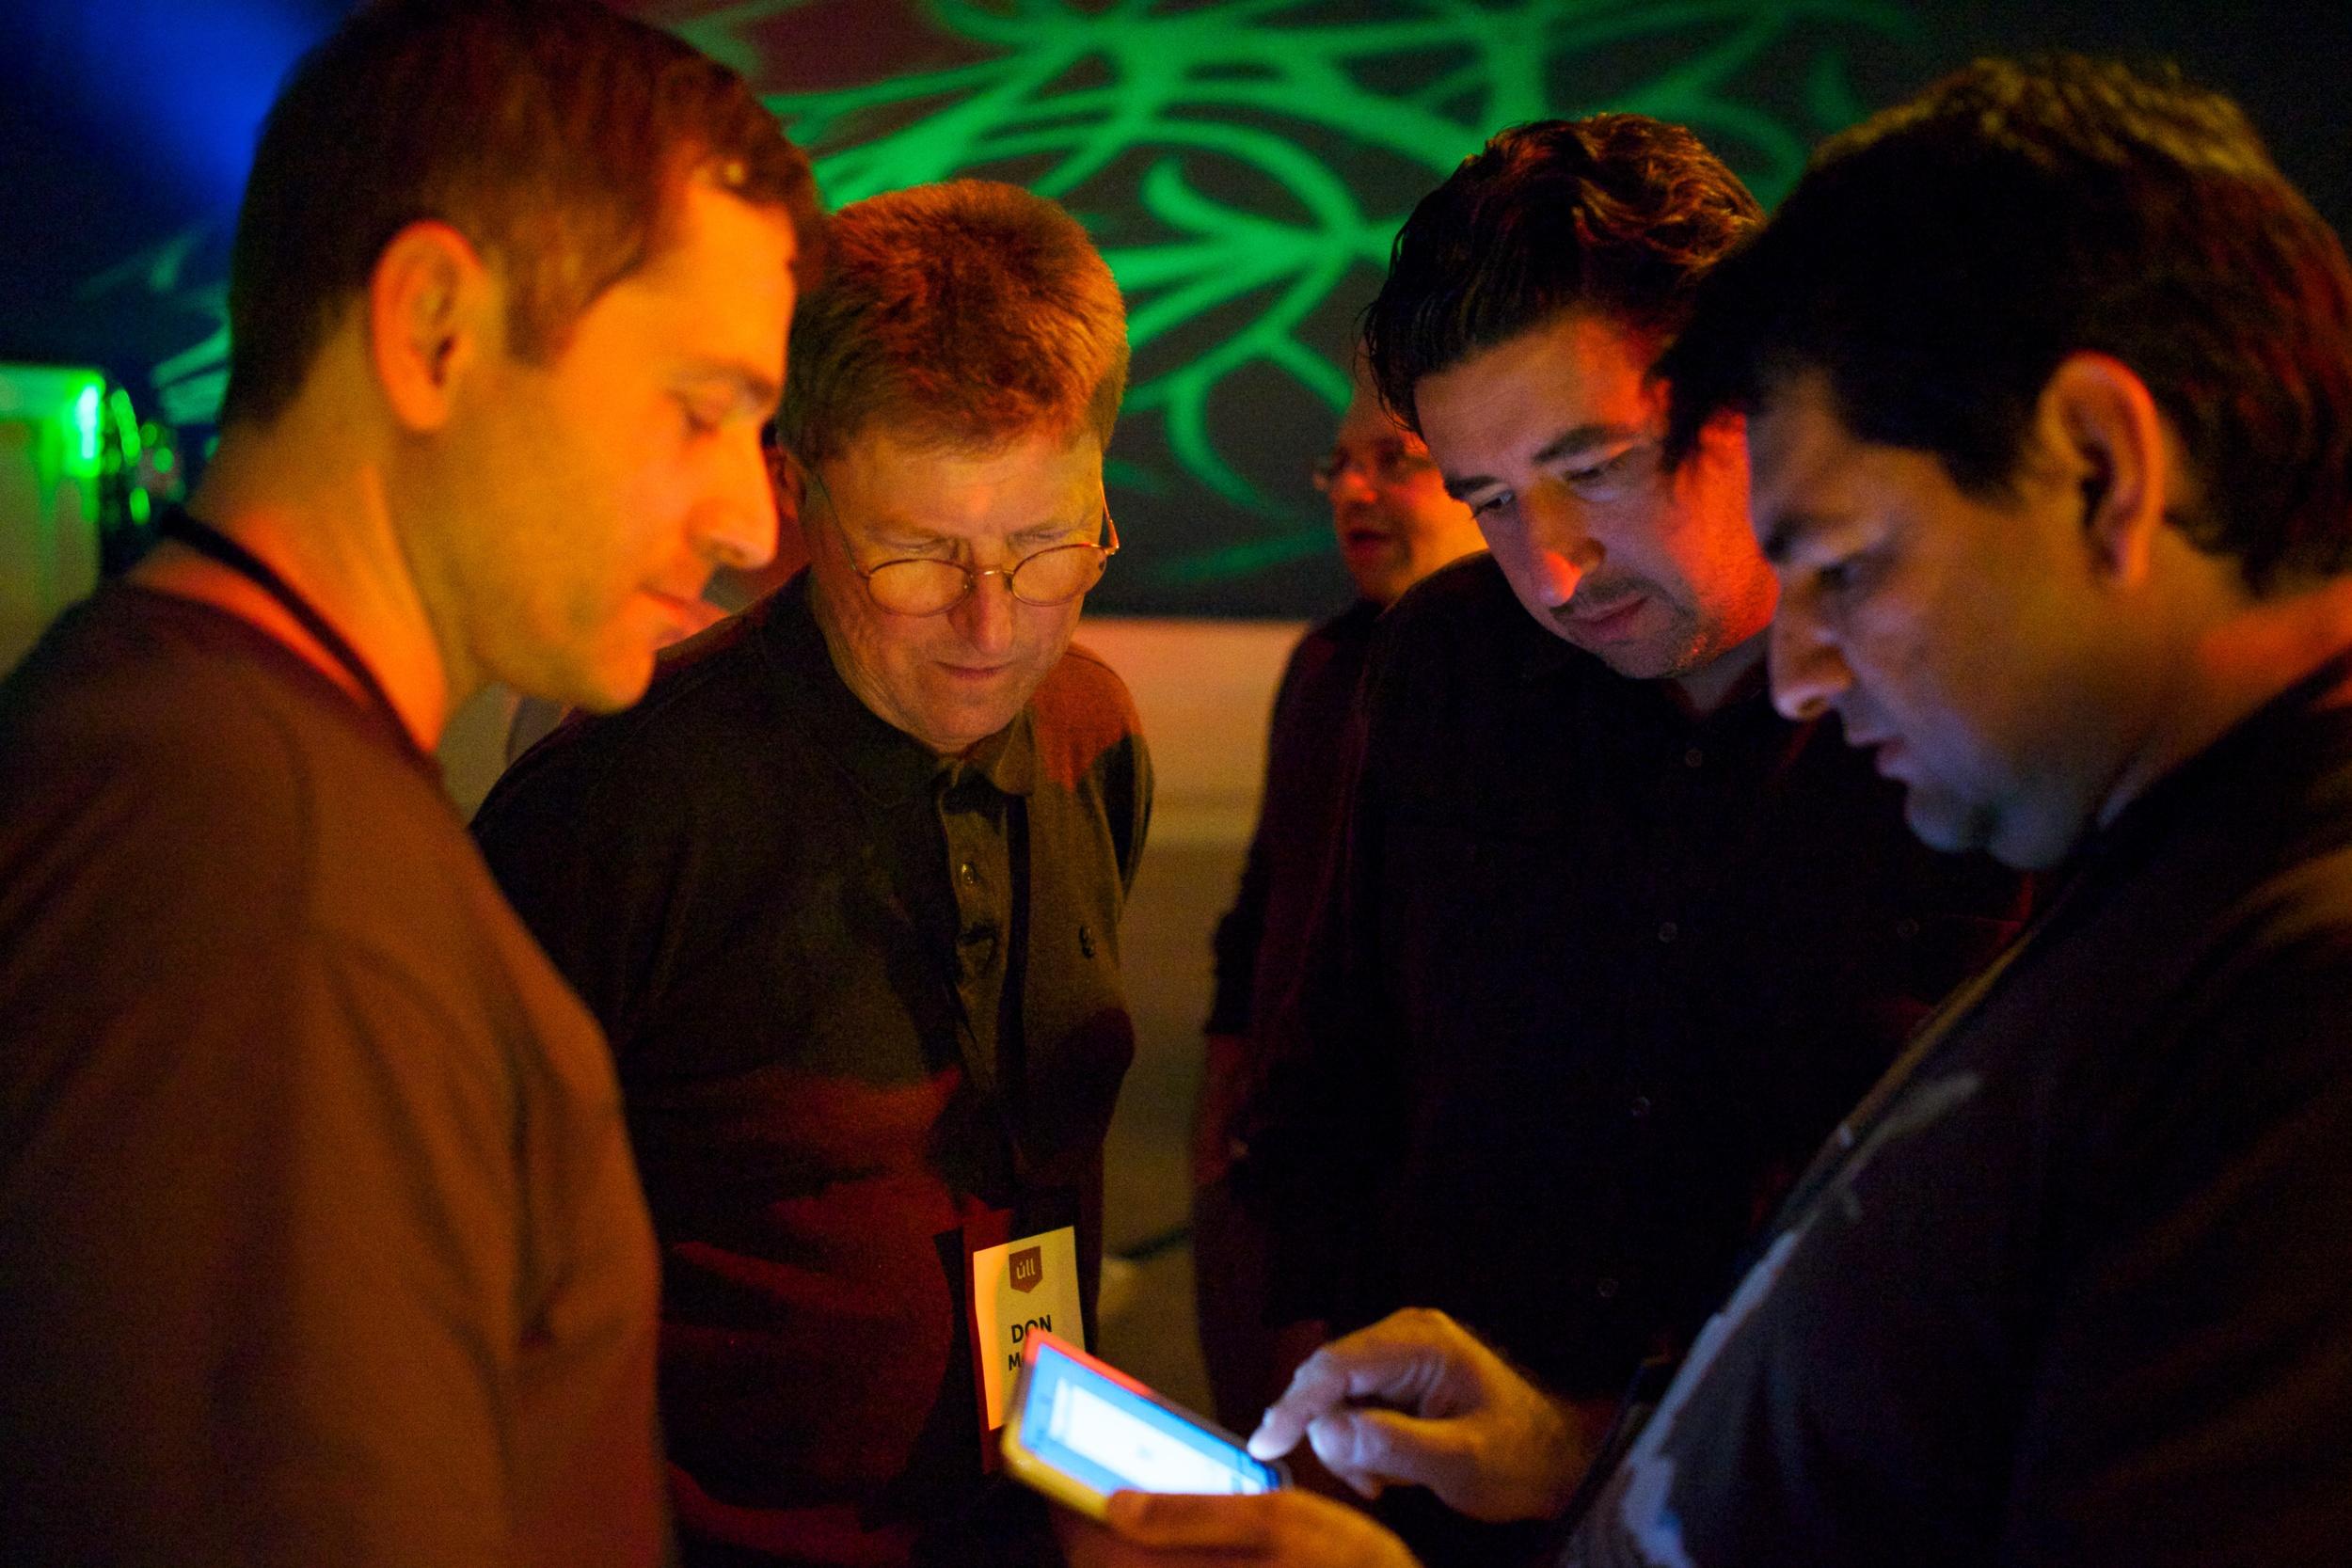 @FarshadNayeri showing off @pixxa Perspective App to @gruber, @donmelton, @asymco at @ullconf 2013. flic.kr/p/ebN4ZW